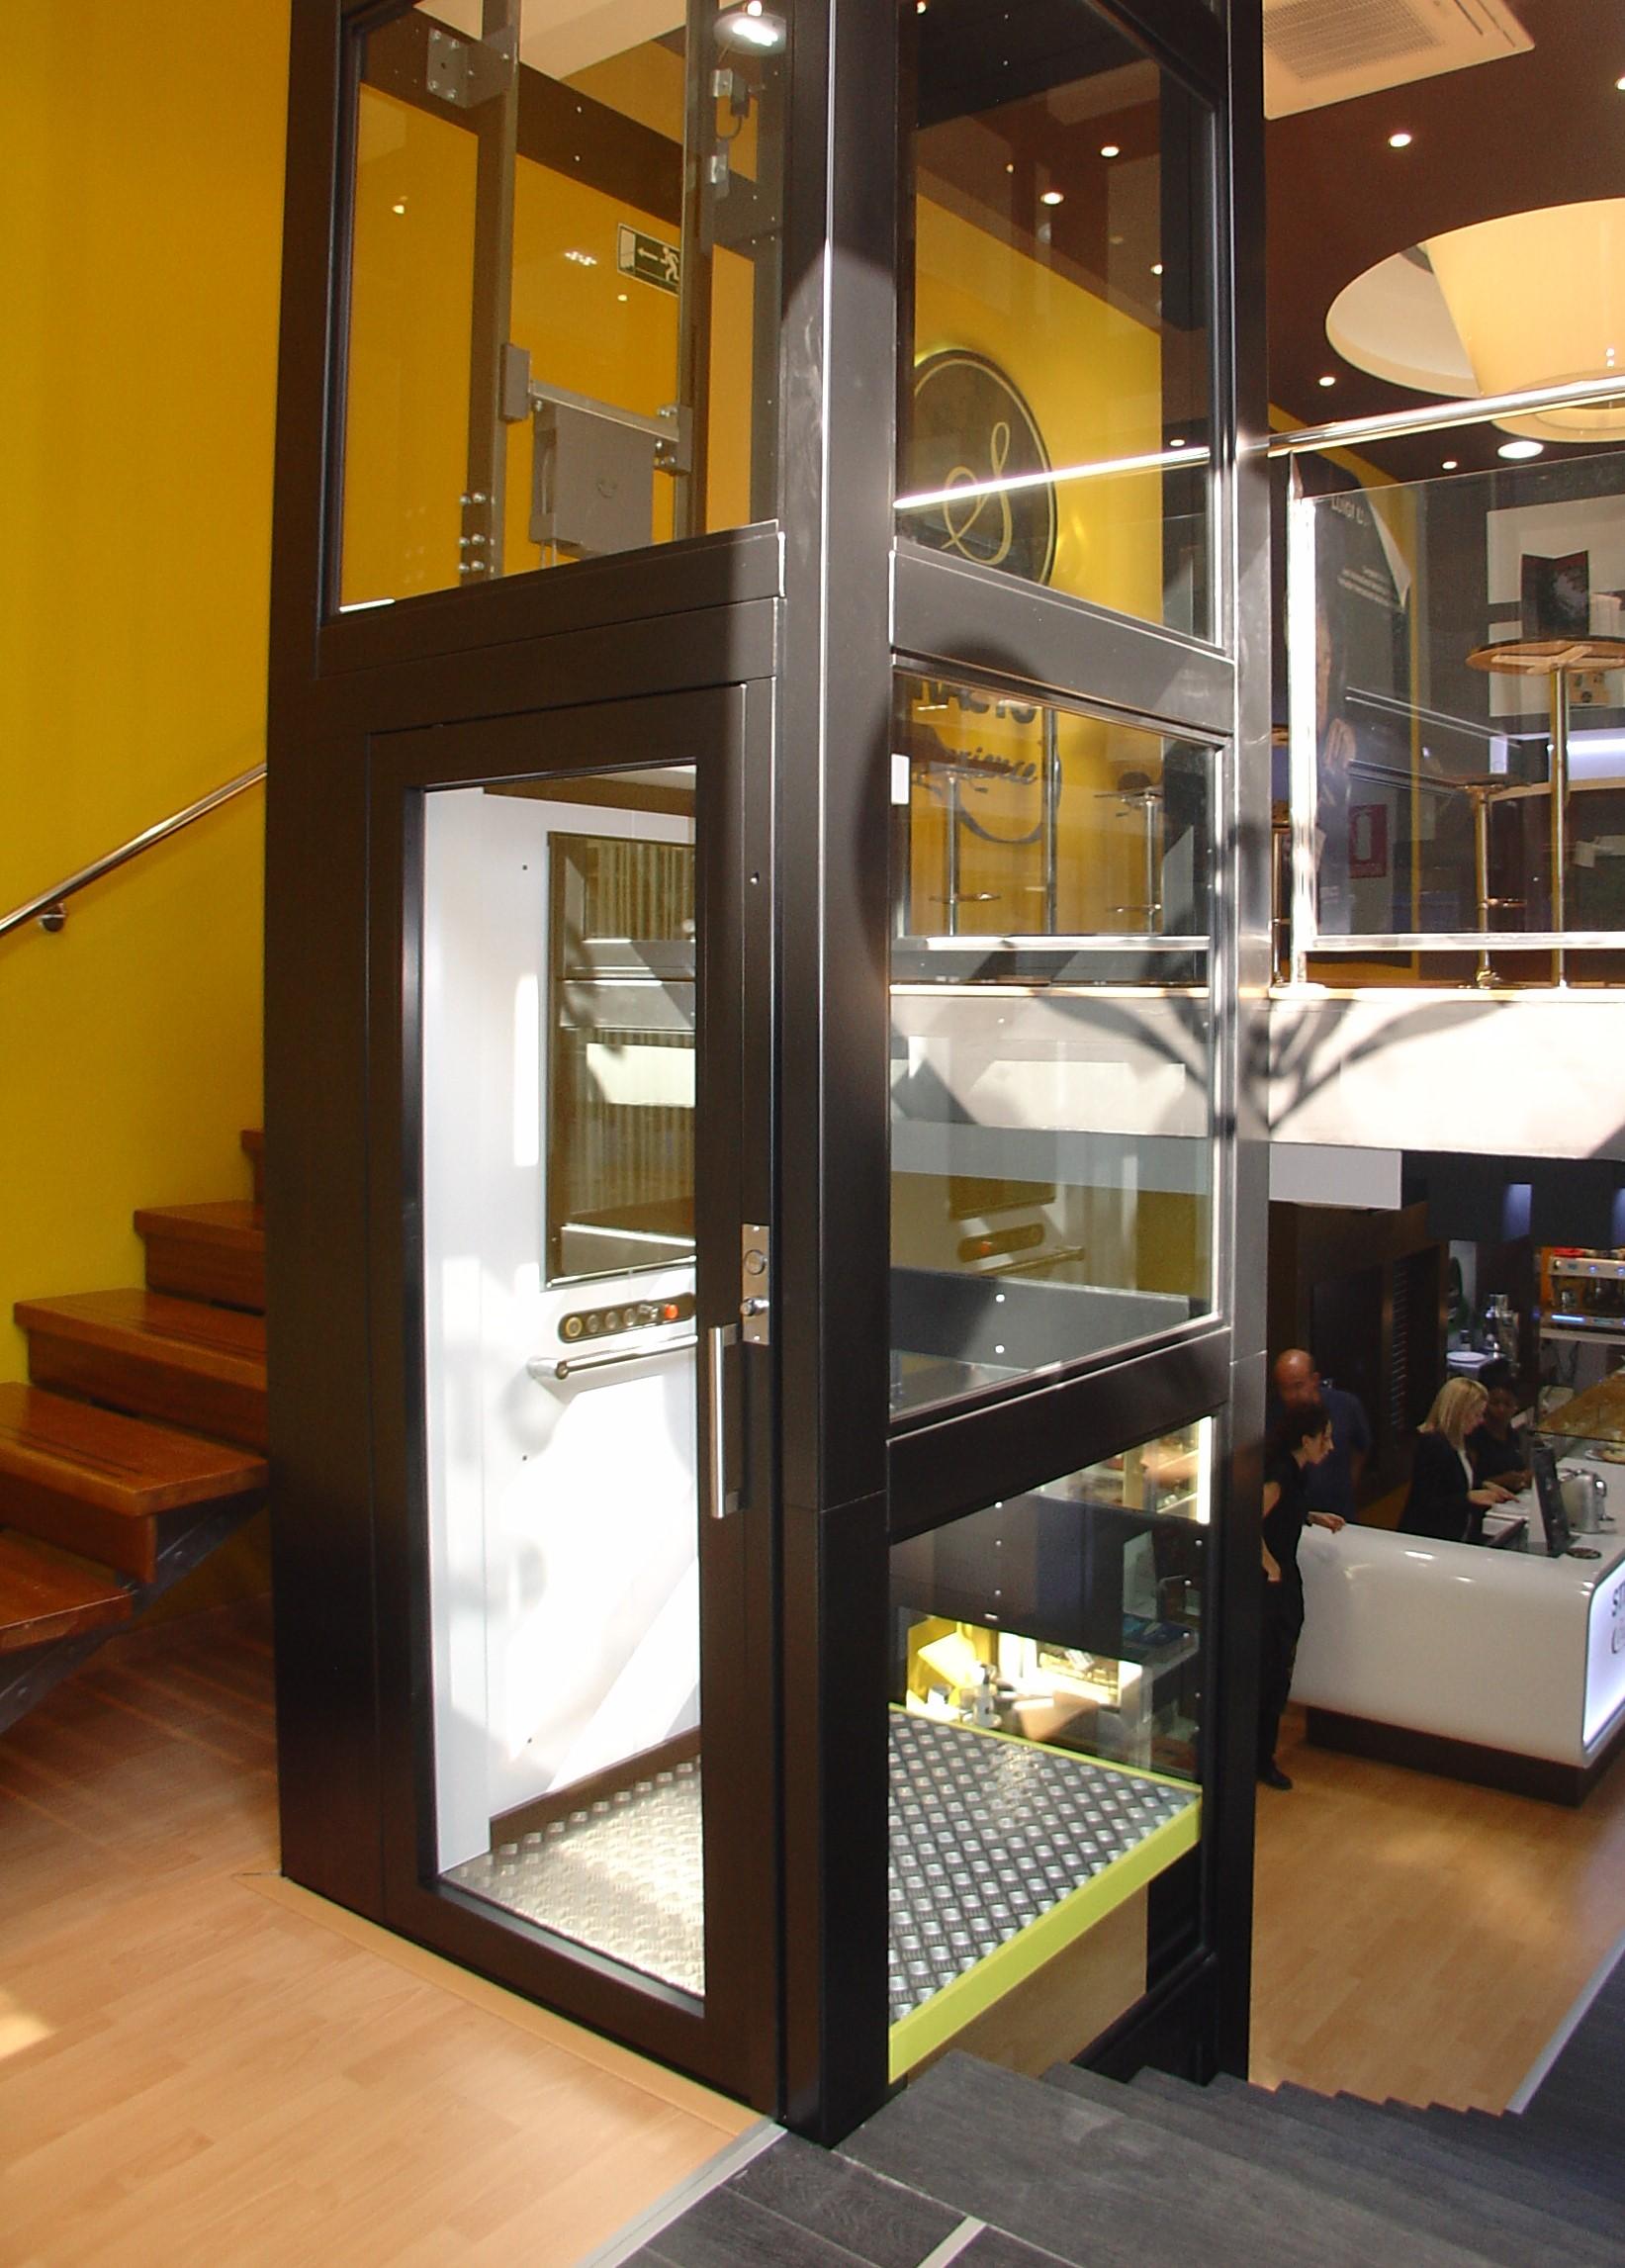 Plateforme verticale design